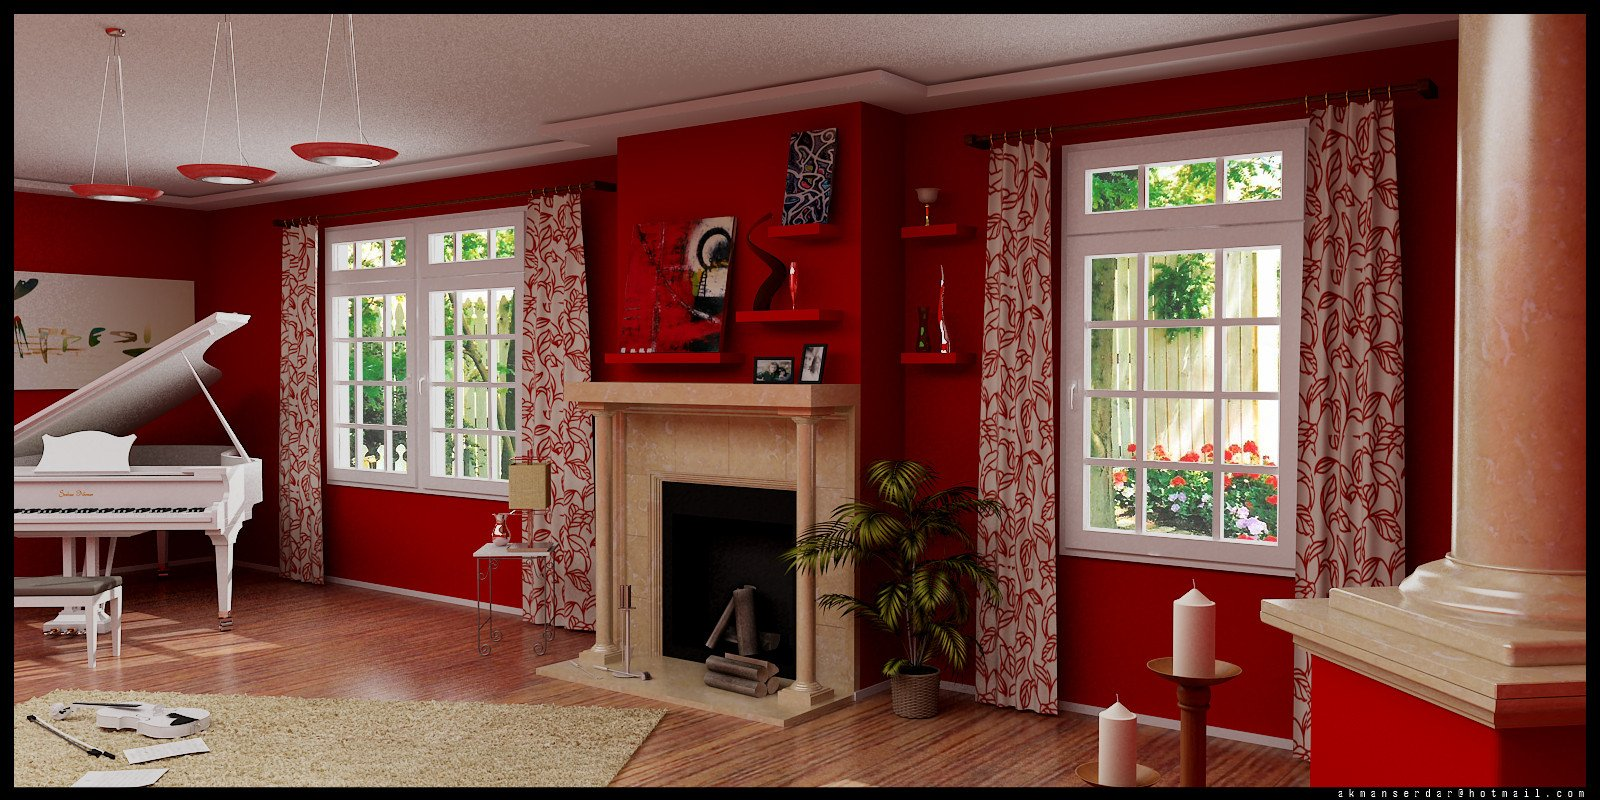 Red Decor for Living Room Luxury September 2012 Anne Wright Interiors